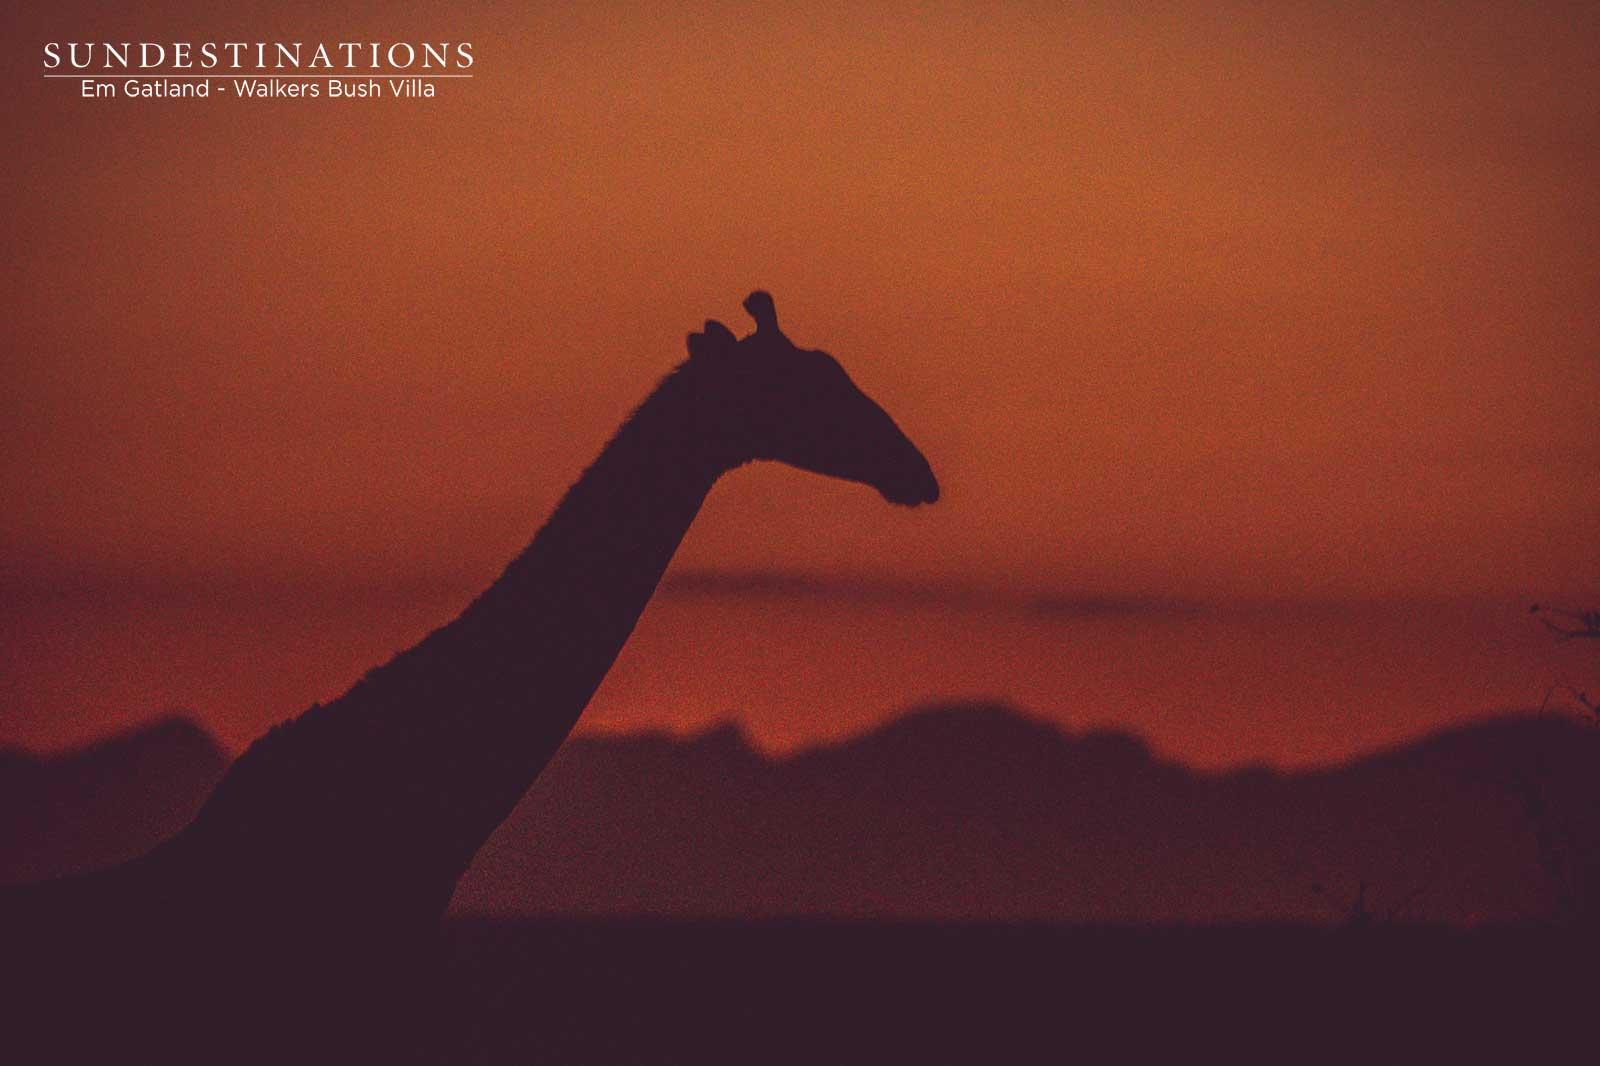 Giraffe at Sunset Walkers Bush Villa